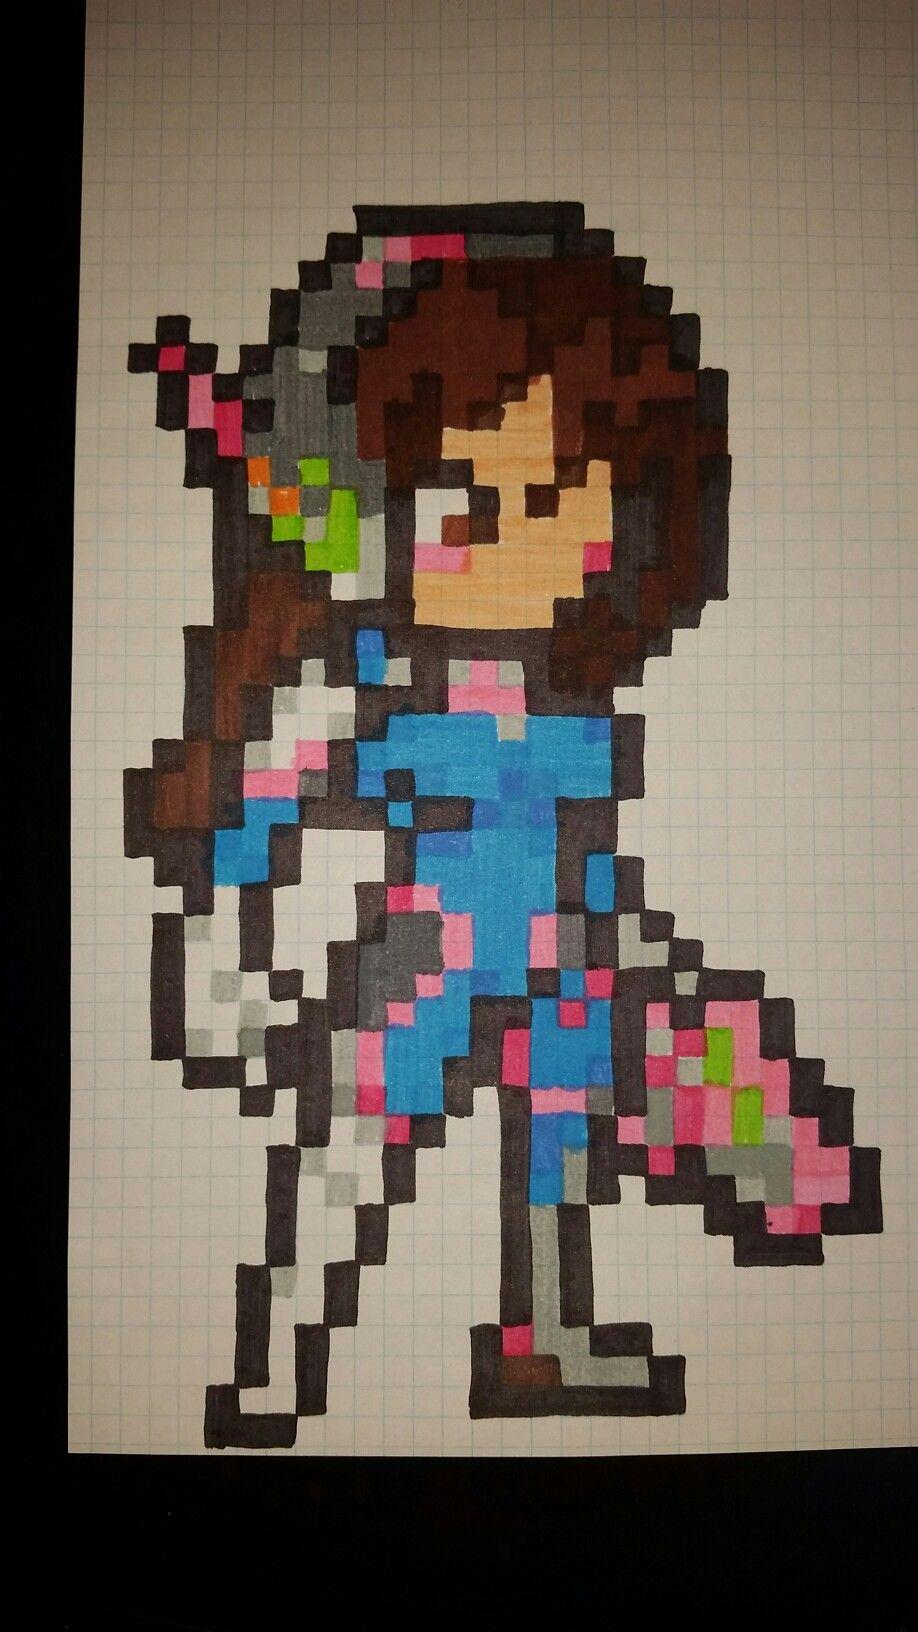 Colorear Pixel Art Pixel Art Colorear Por Nmeros